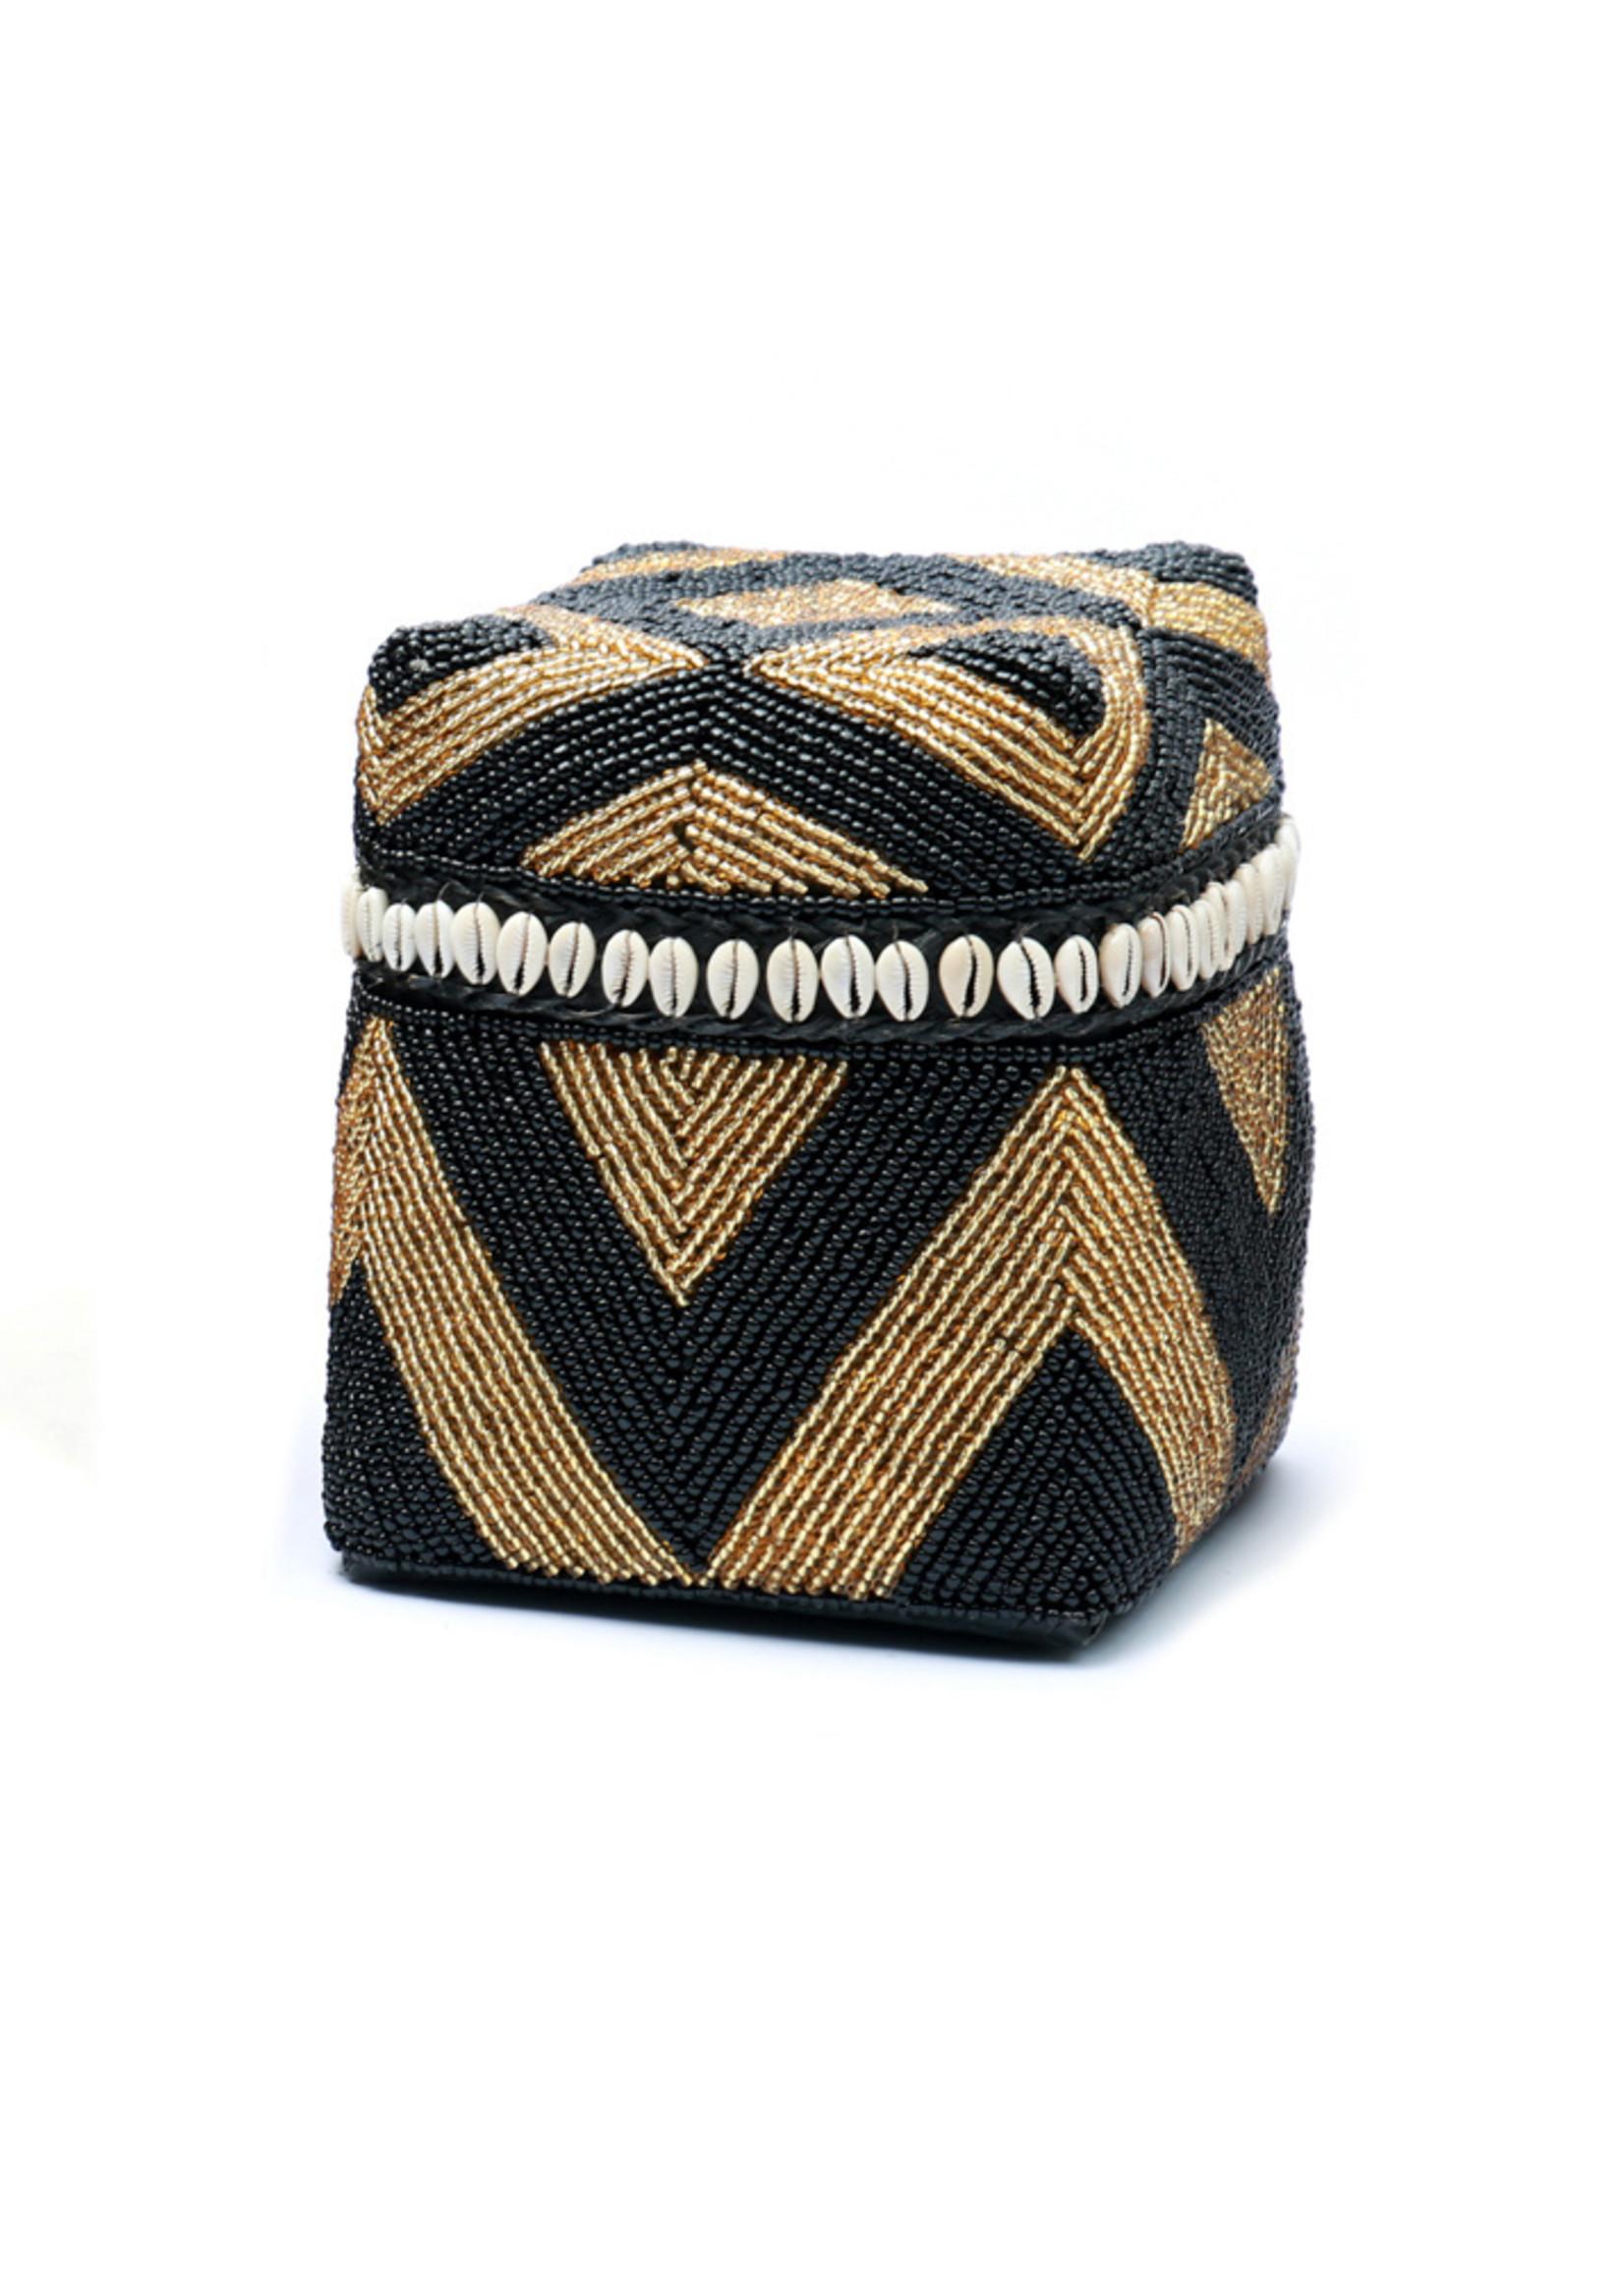 The Beaded Basket Cowrie Diamond High - Black Gold - M